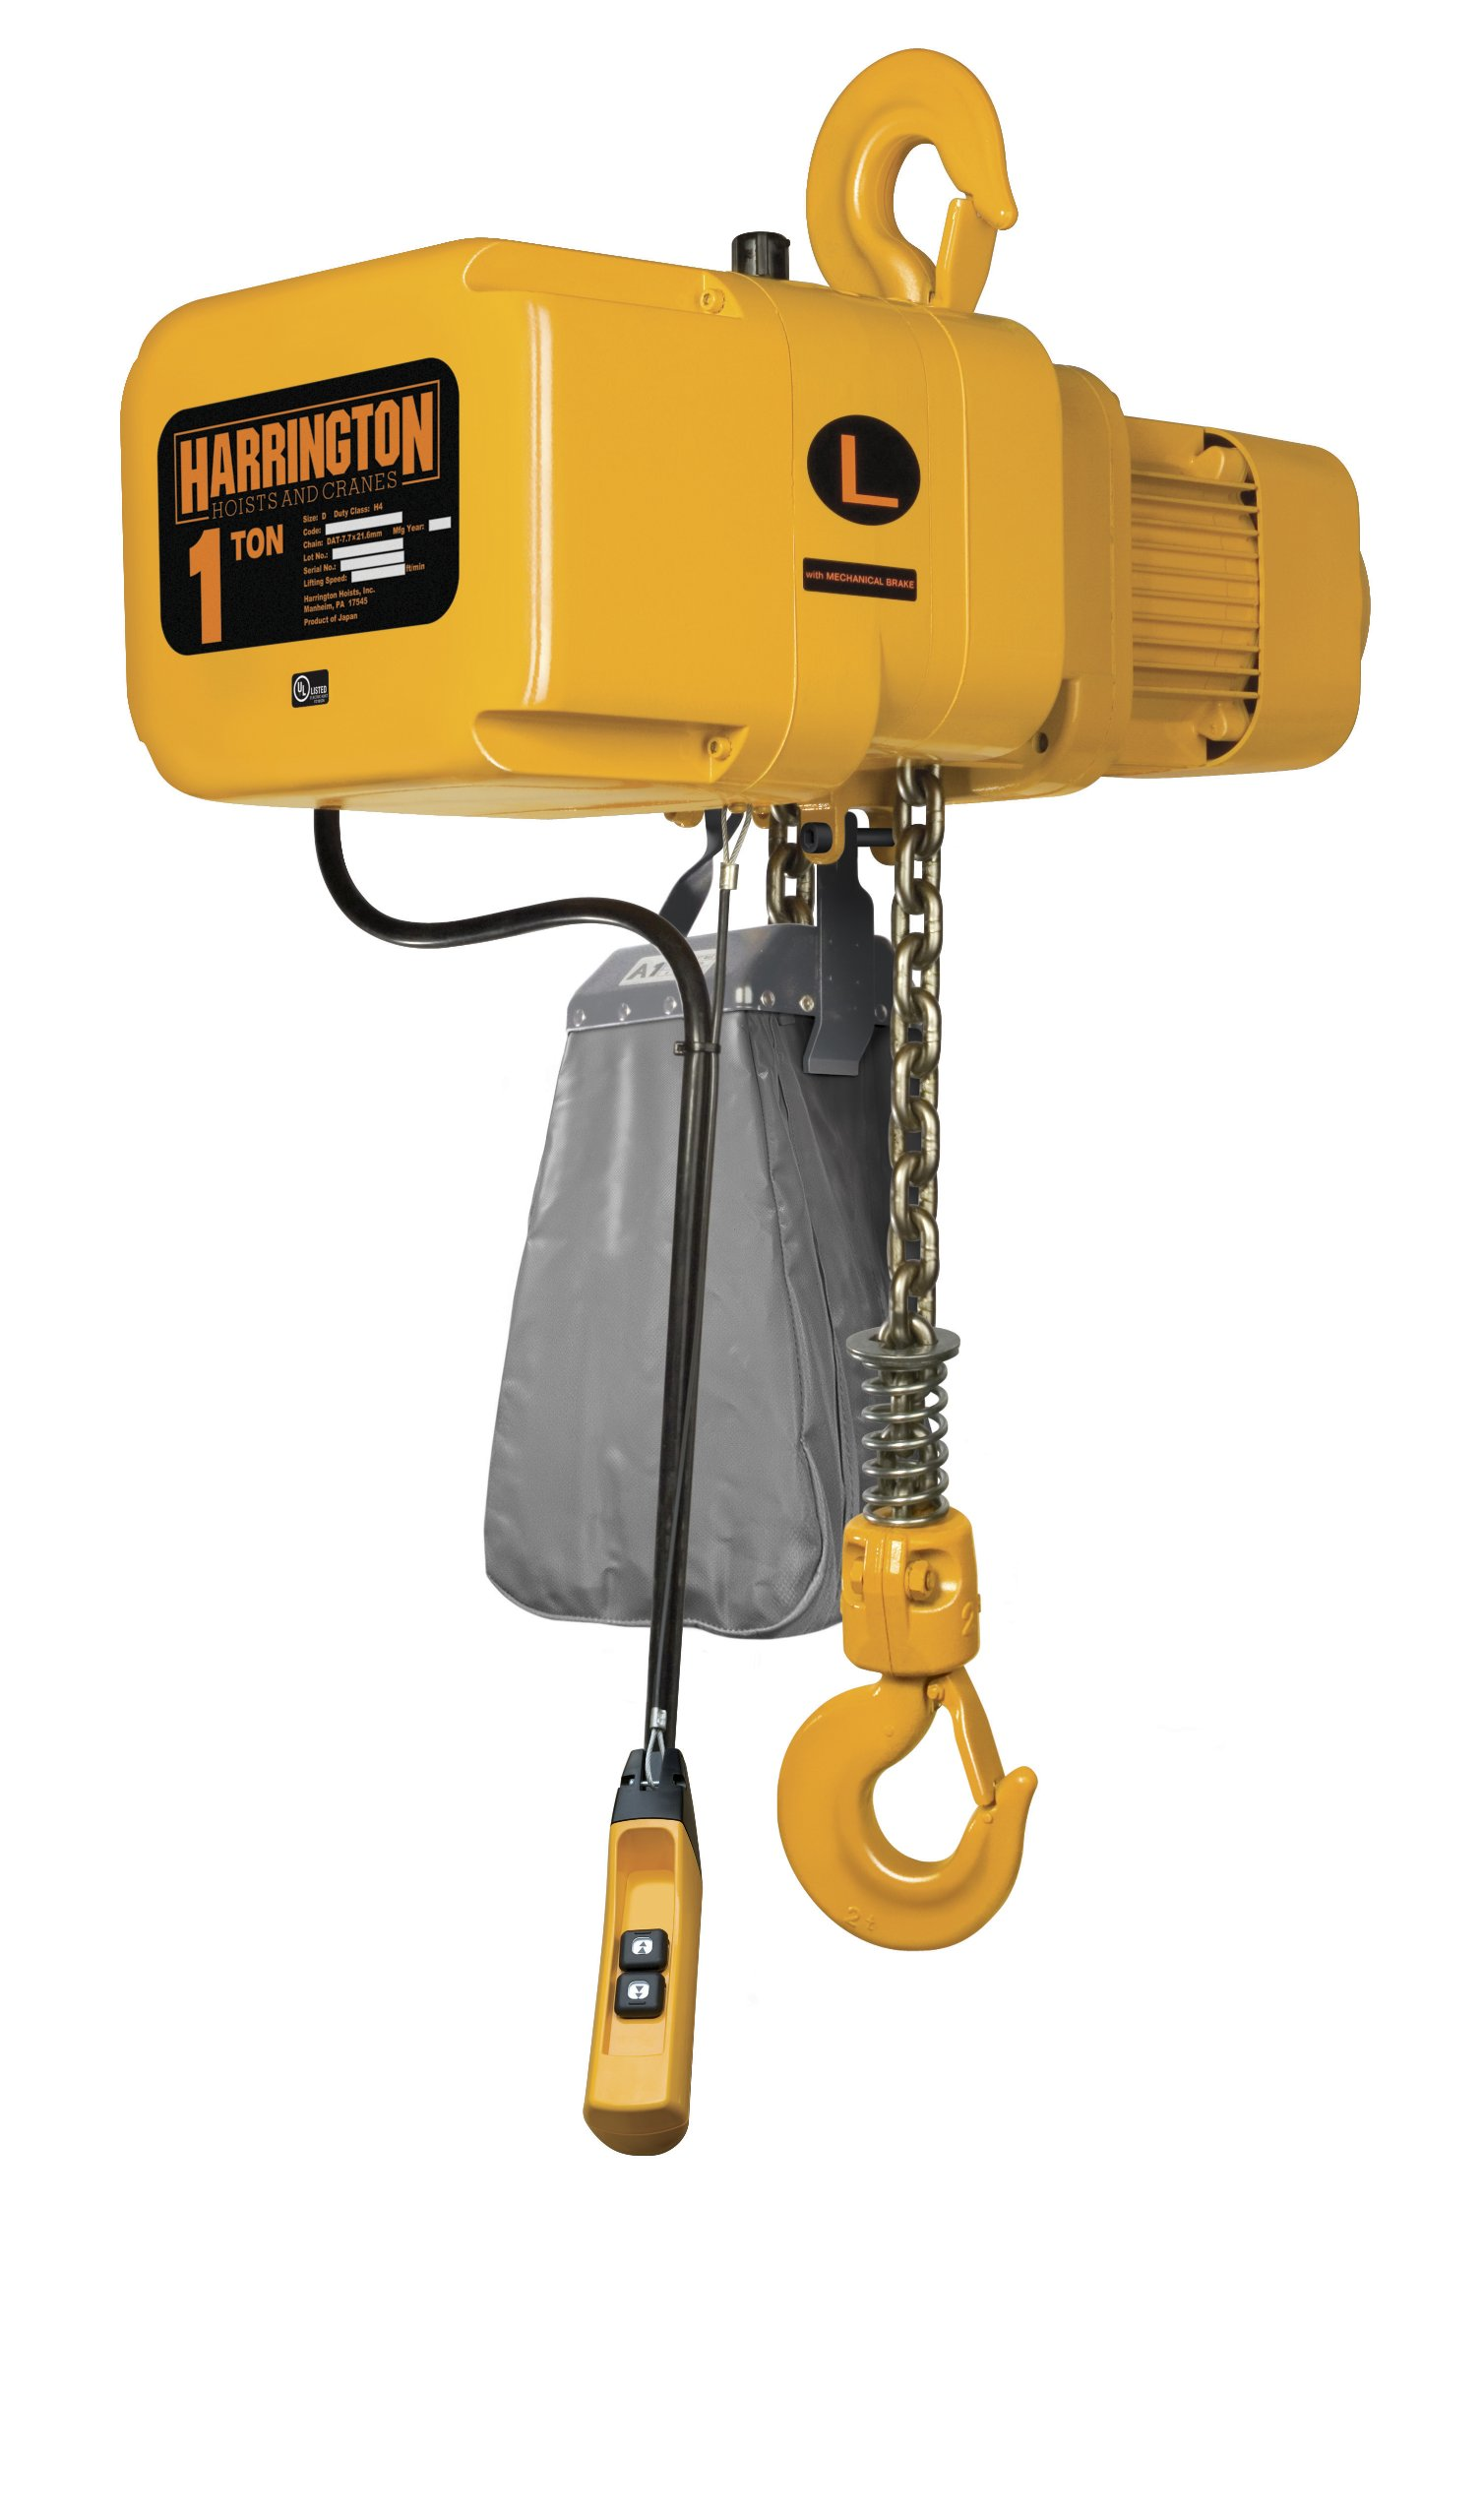 Harrington NER Single Speed Electric Chain Hoist, Three Phase, Hook Mount, 1 Ton Capacity, 10' Lift, 14 fpm Max Lift Speed, 1.2 HP, 16.9'' Headroom, 1.2'' Hook Opening, 208/230/460V